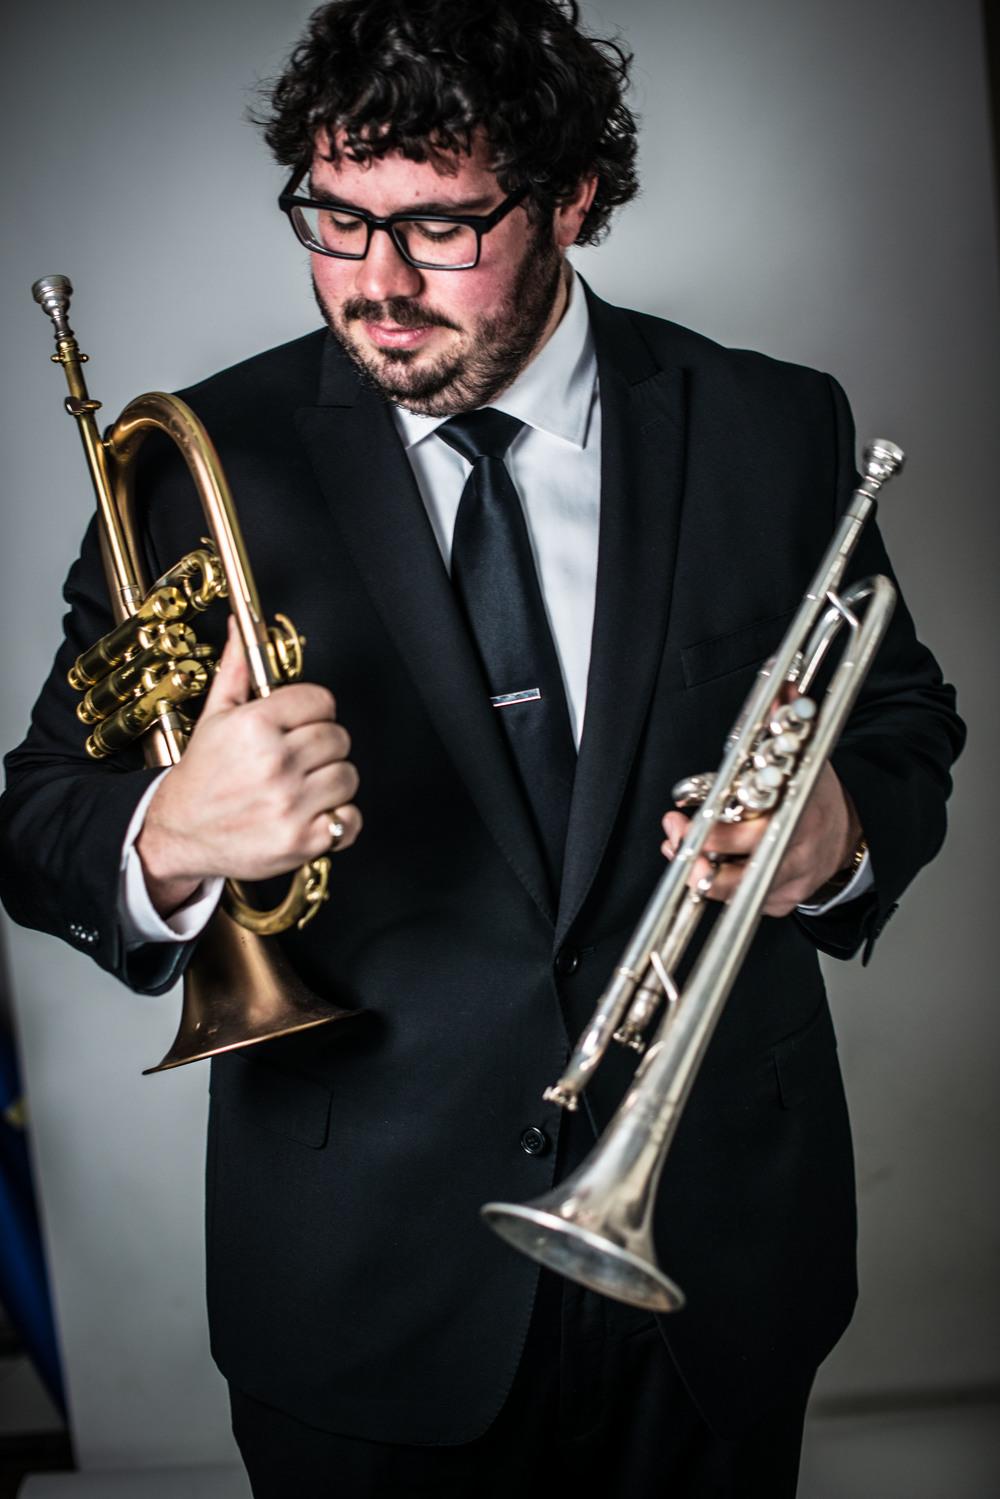 Augie Haas, Photo Credit:Matt Simpkins